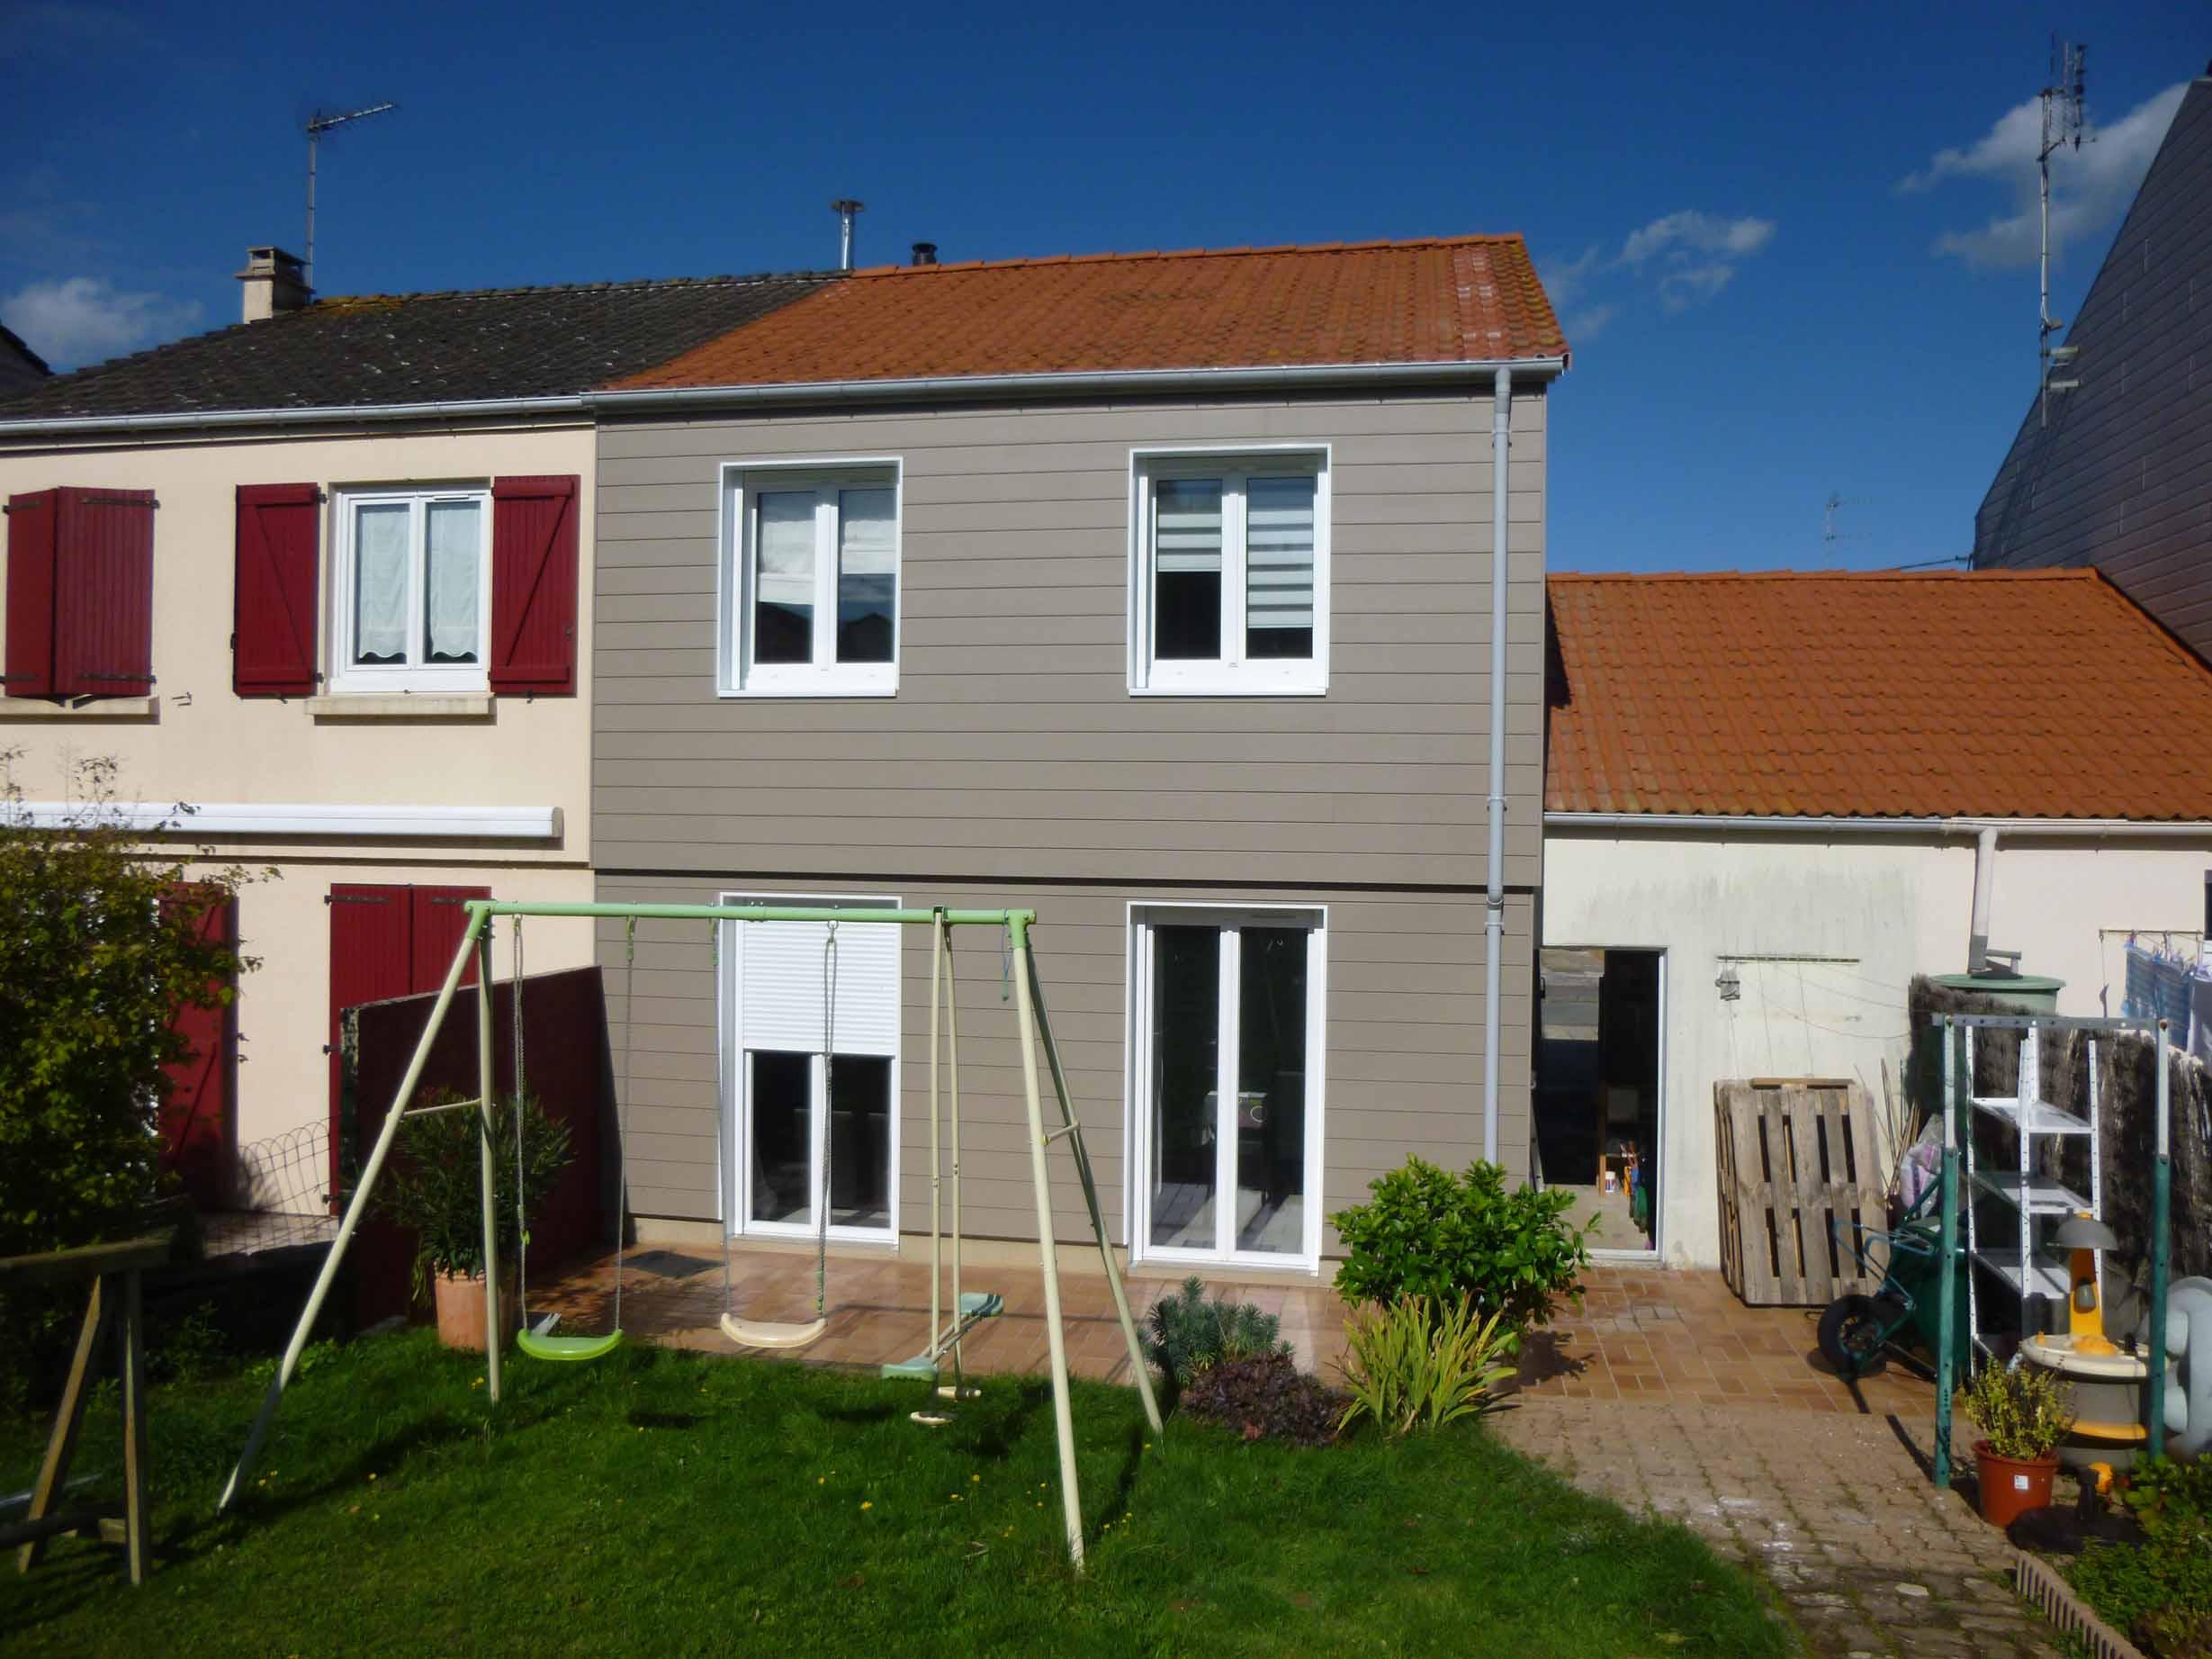 Constructeur maison individuelle orvault for Constructeurs maisons individuelles